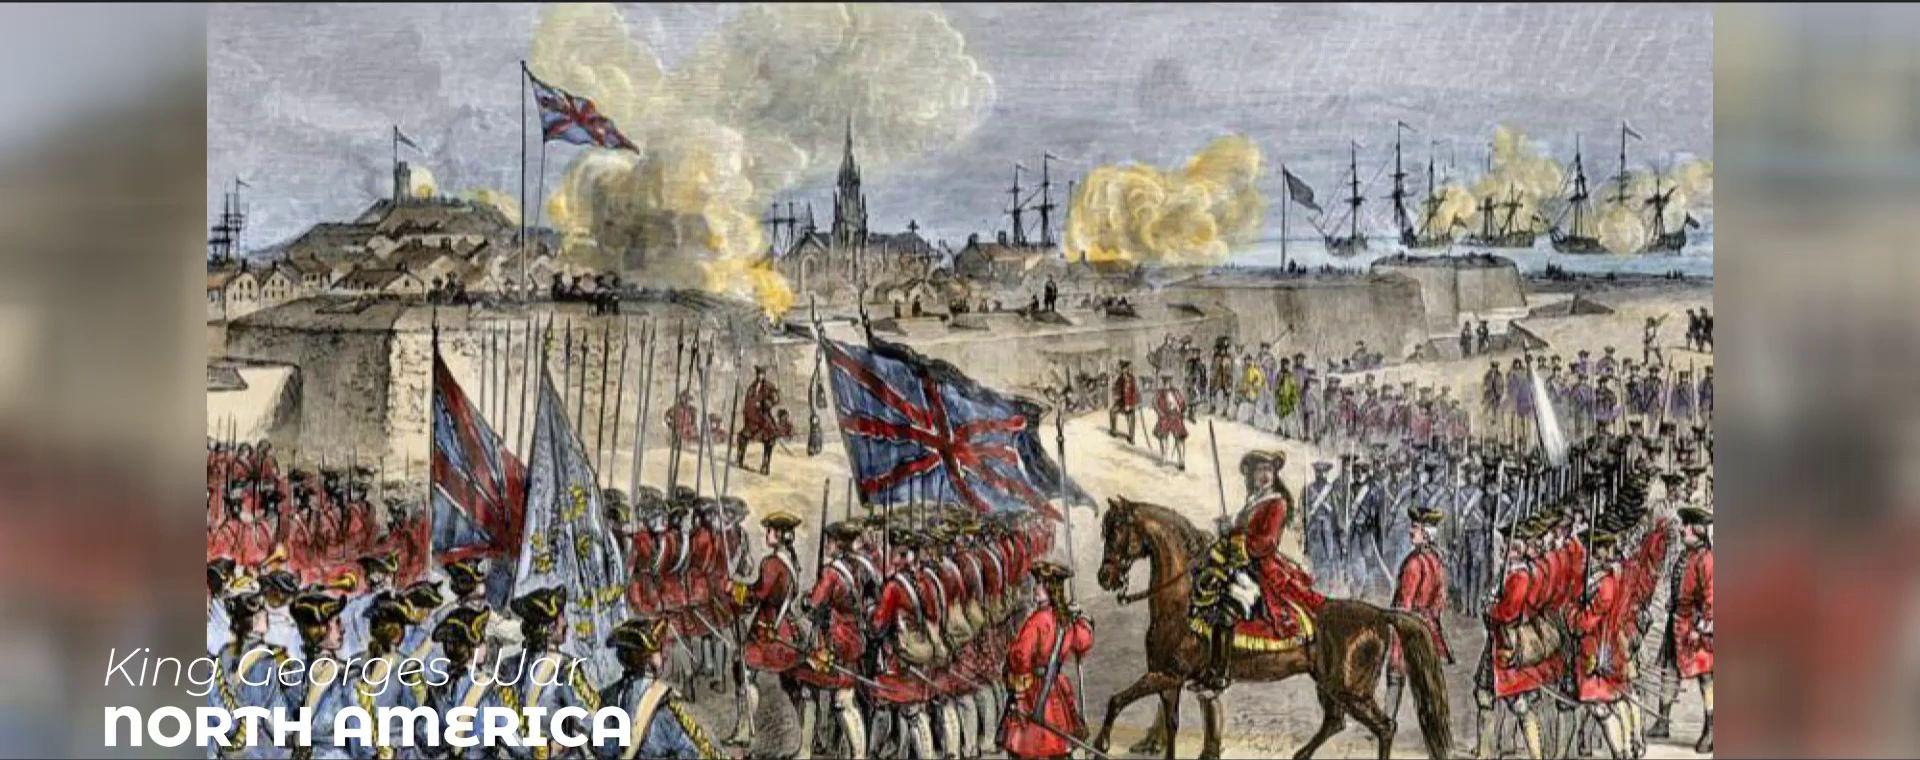 KING GEORGES WAR